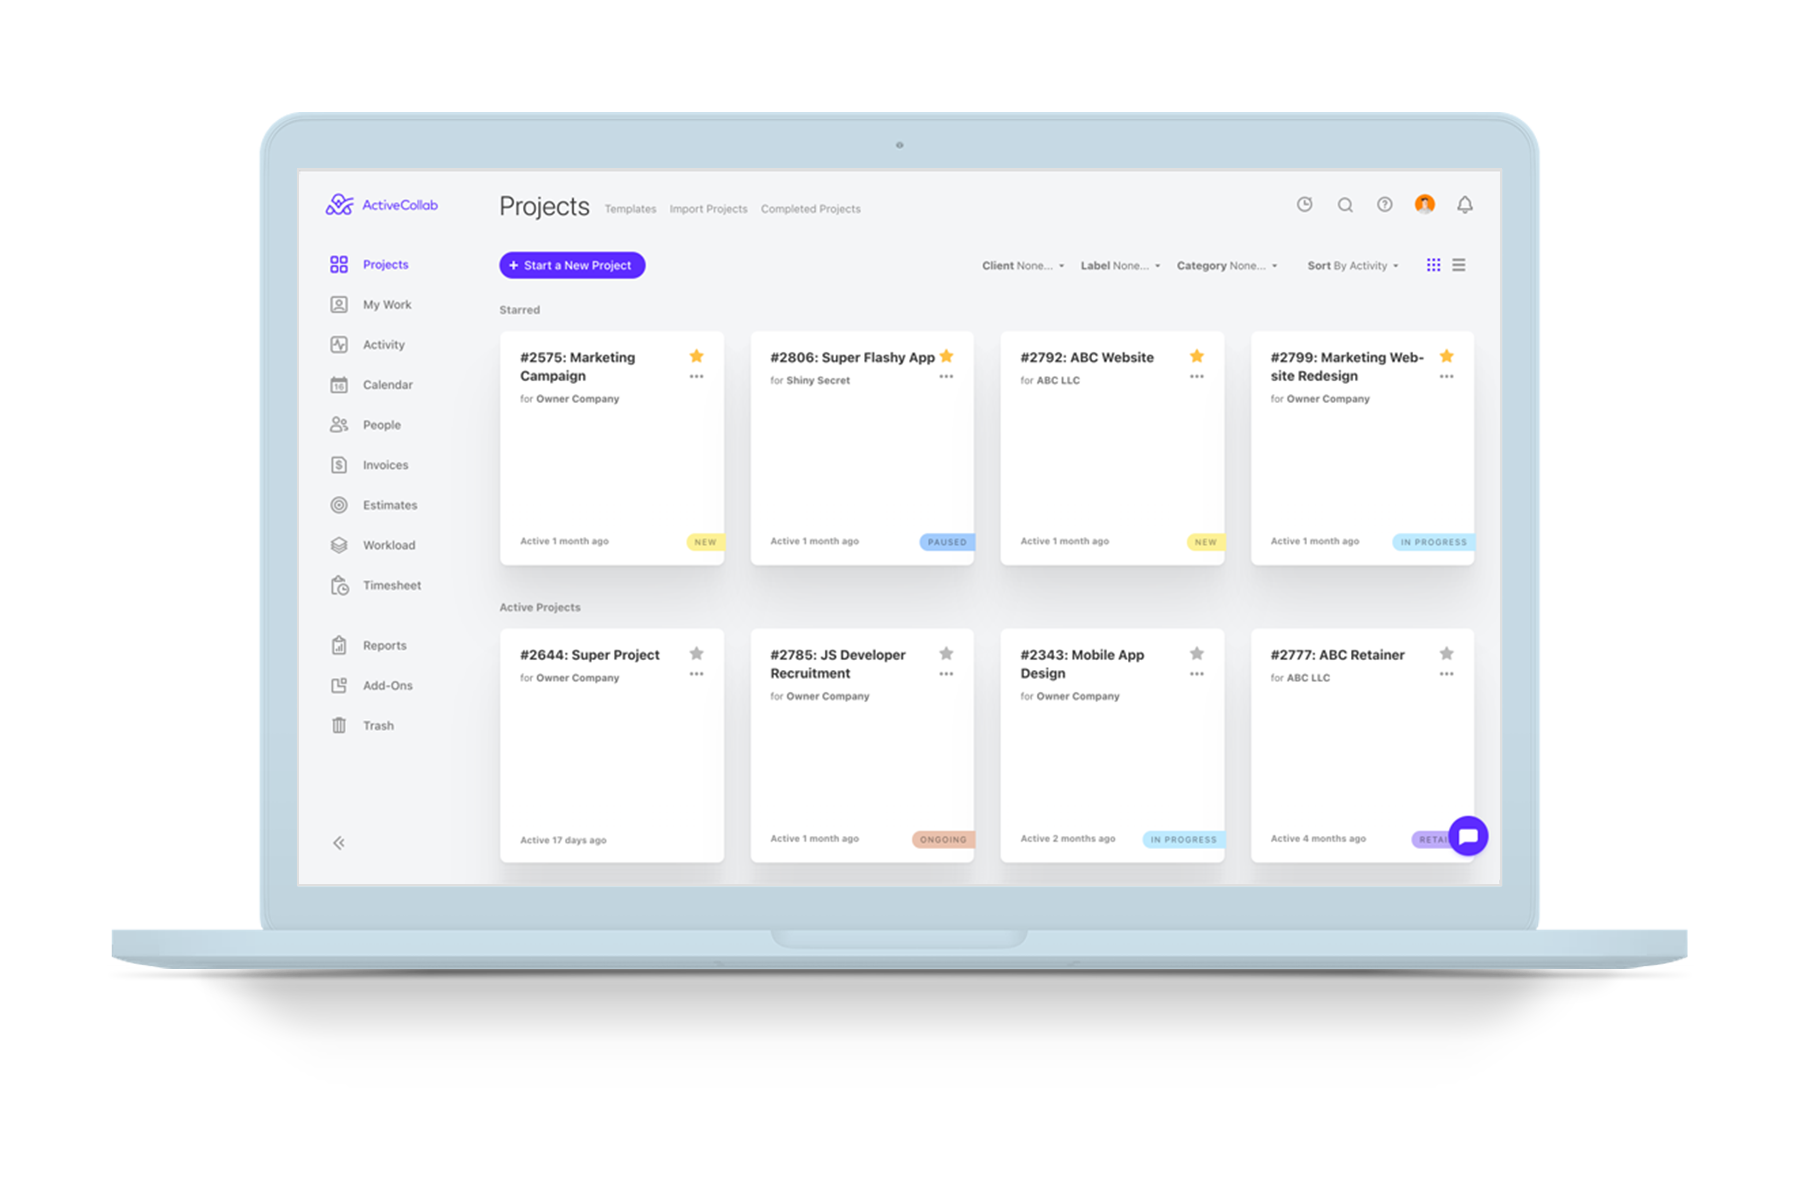 ActiveCollab desktop app